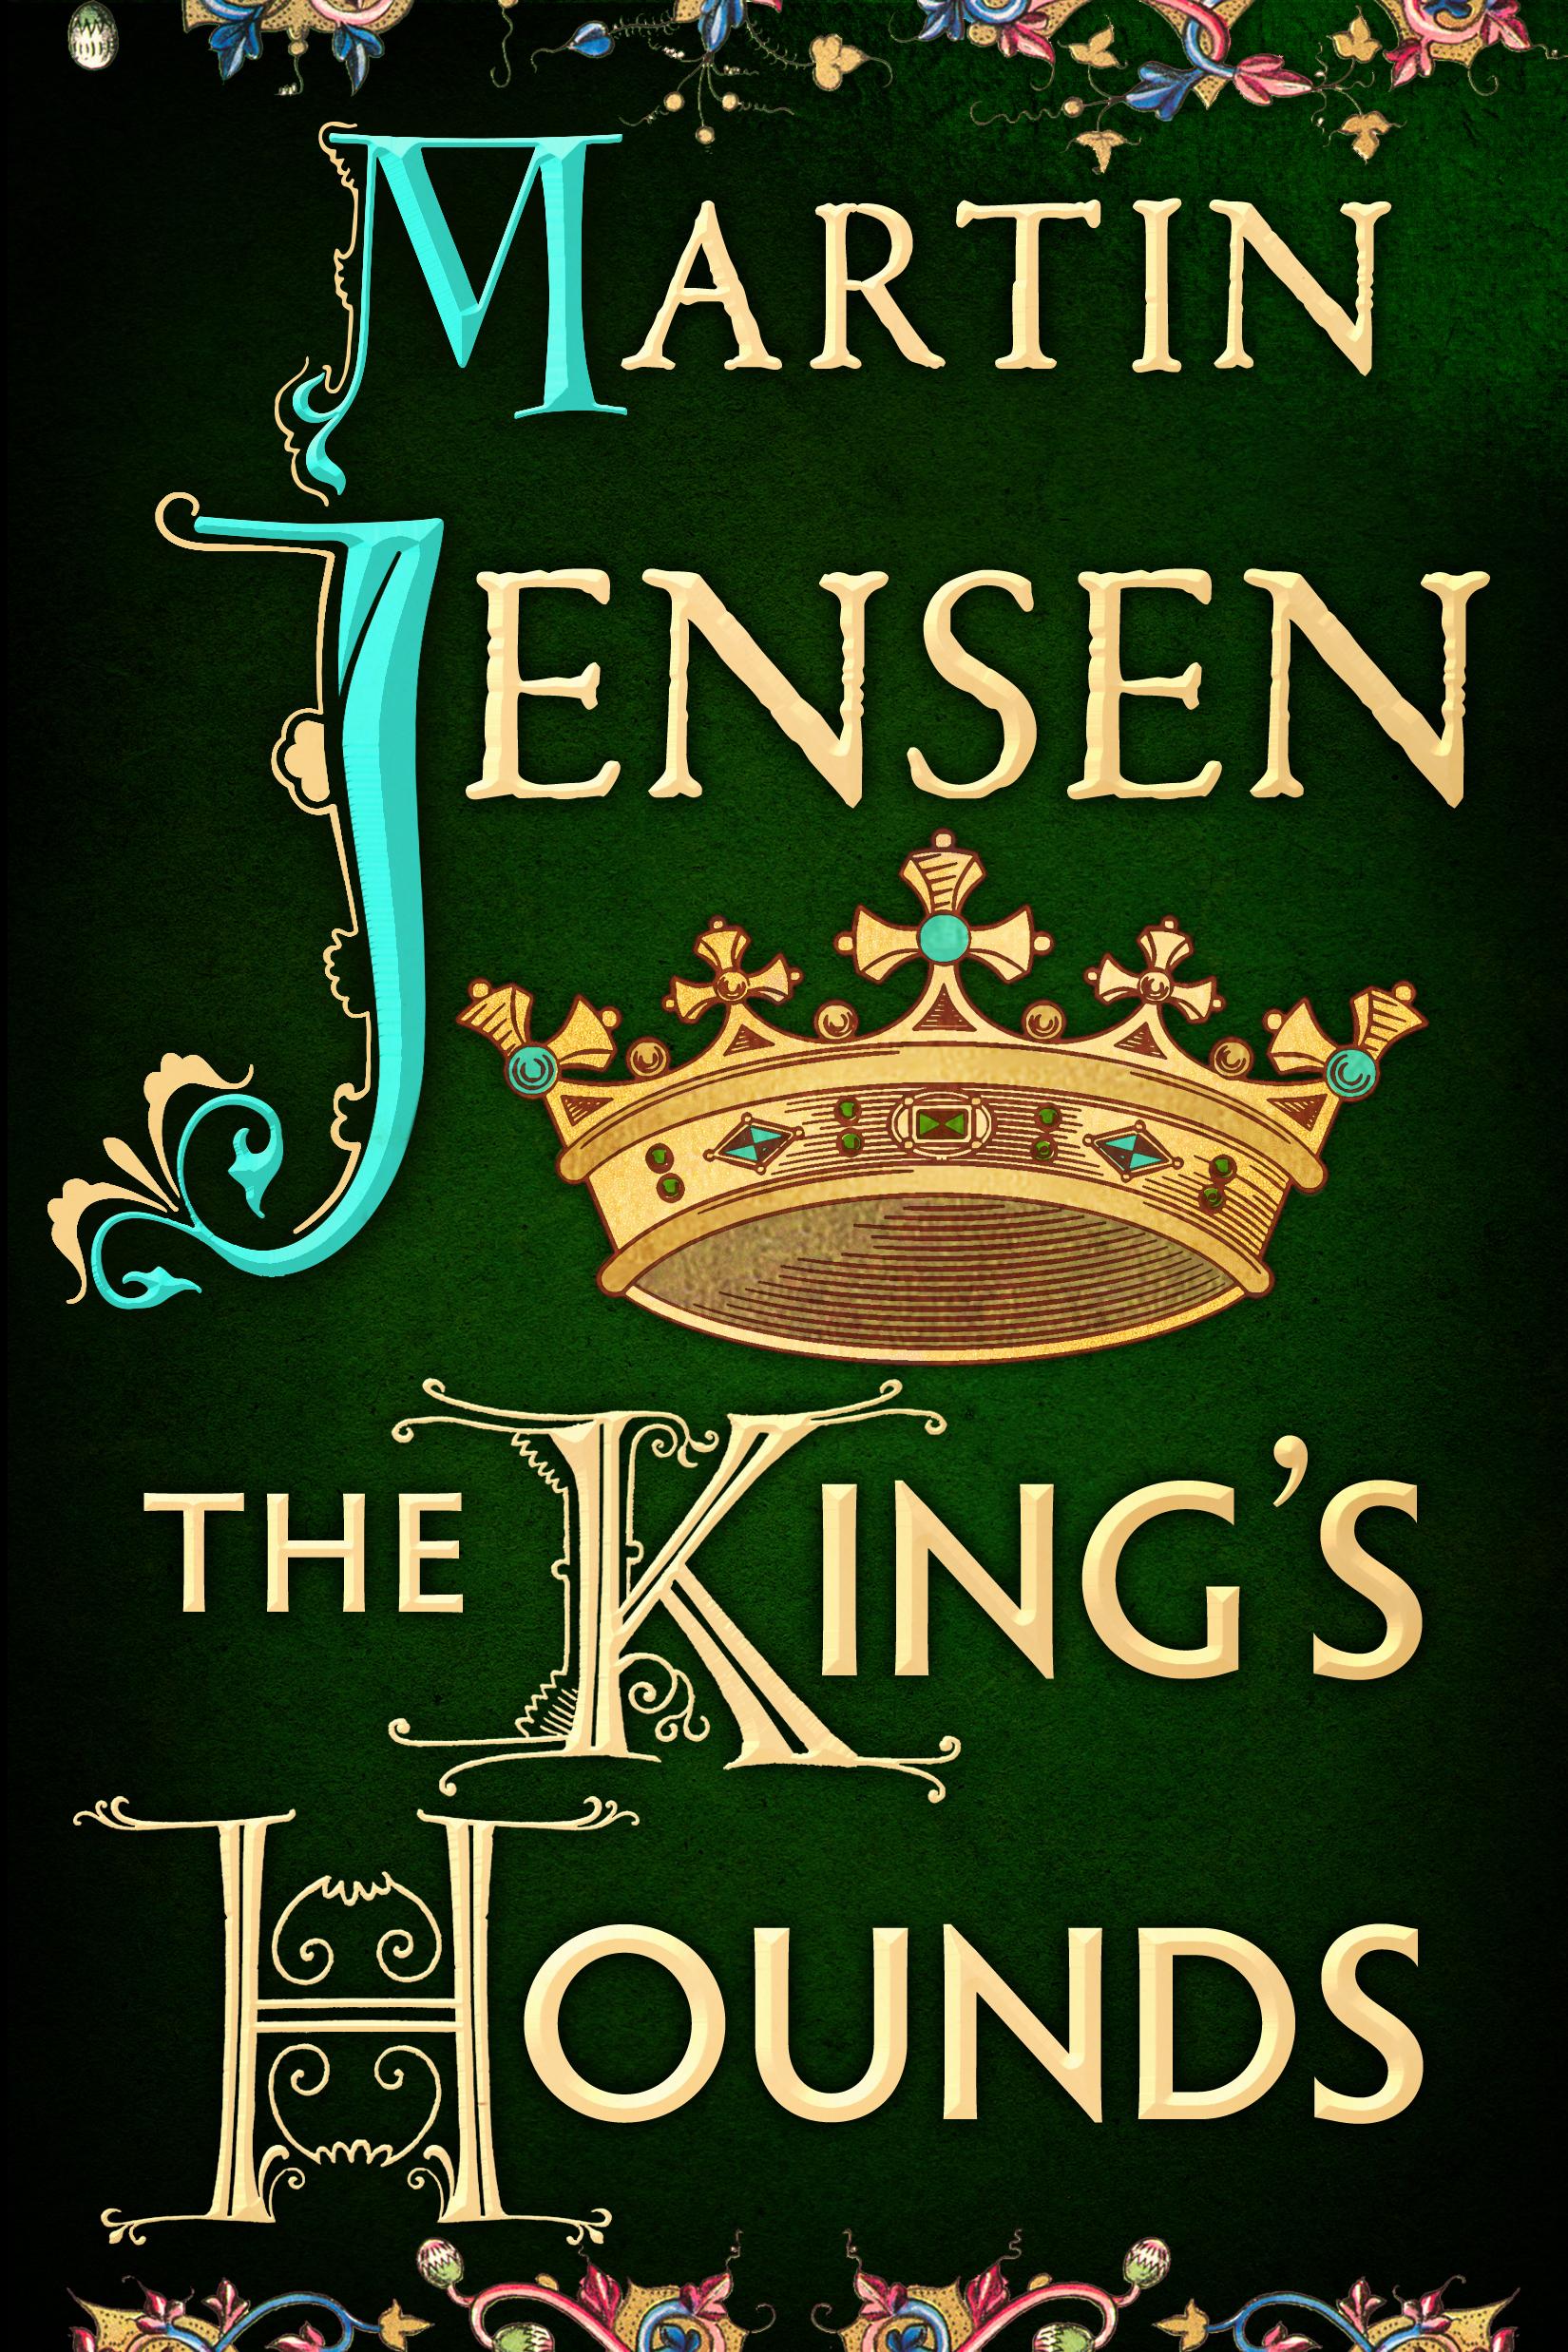 THE KING'S HOUNDS (final jacket).jpg